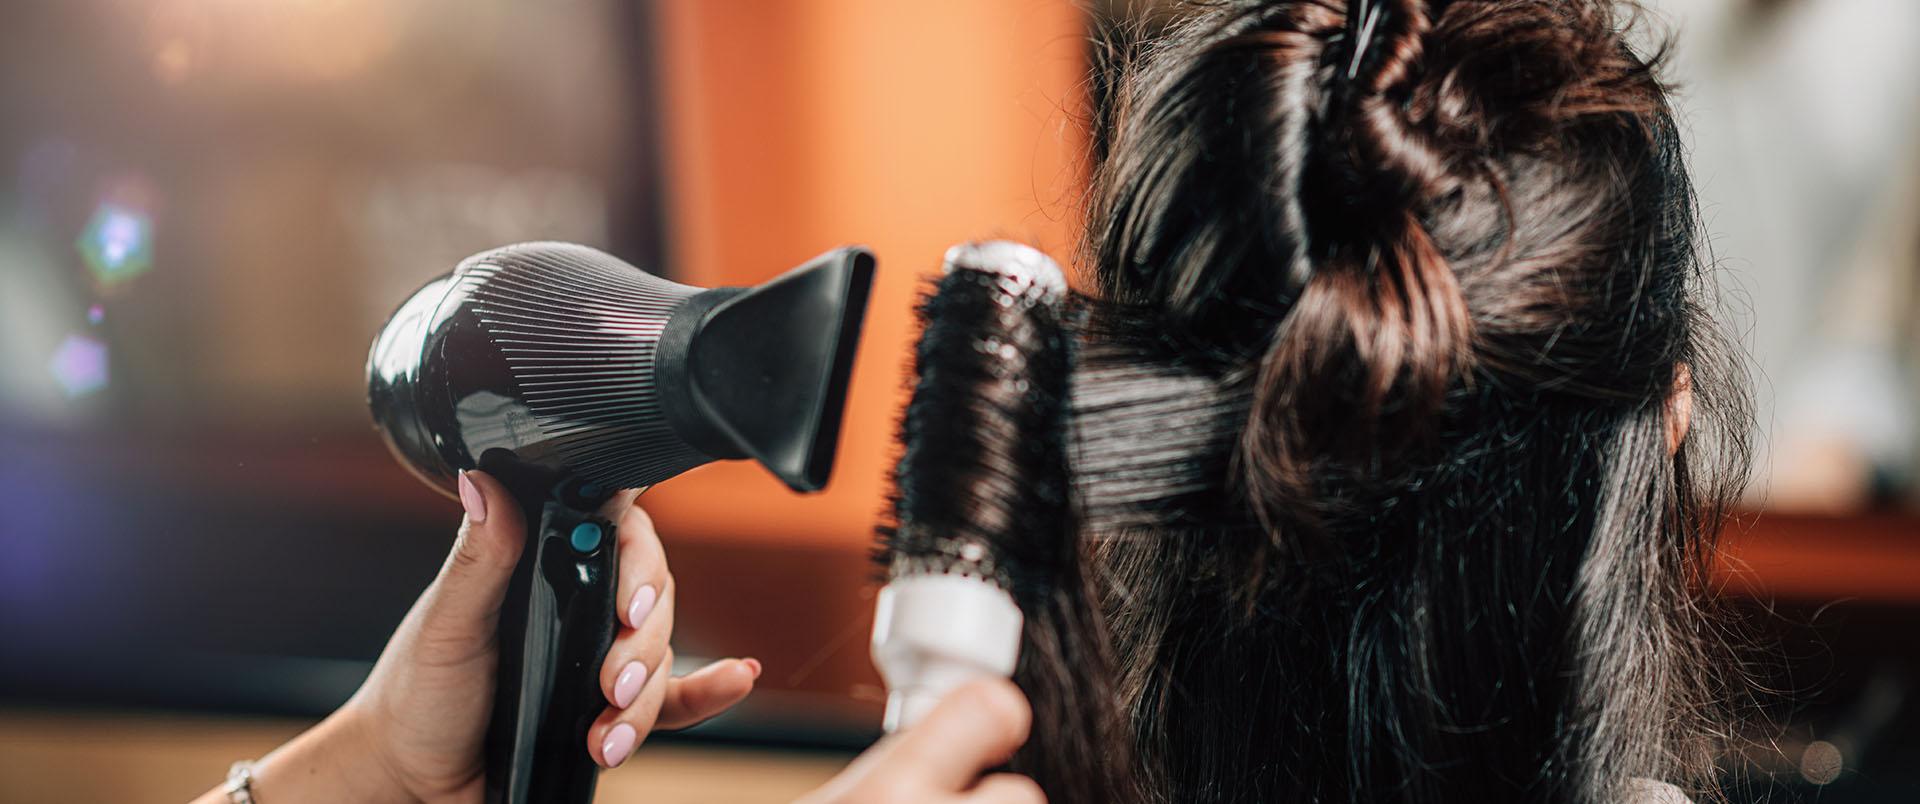 Salon de coiffure à Mulhouse